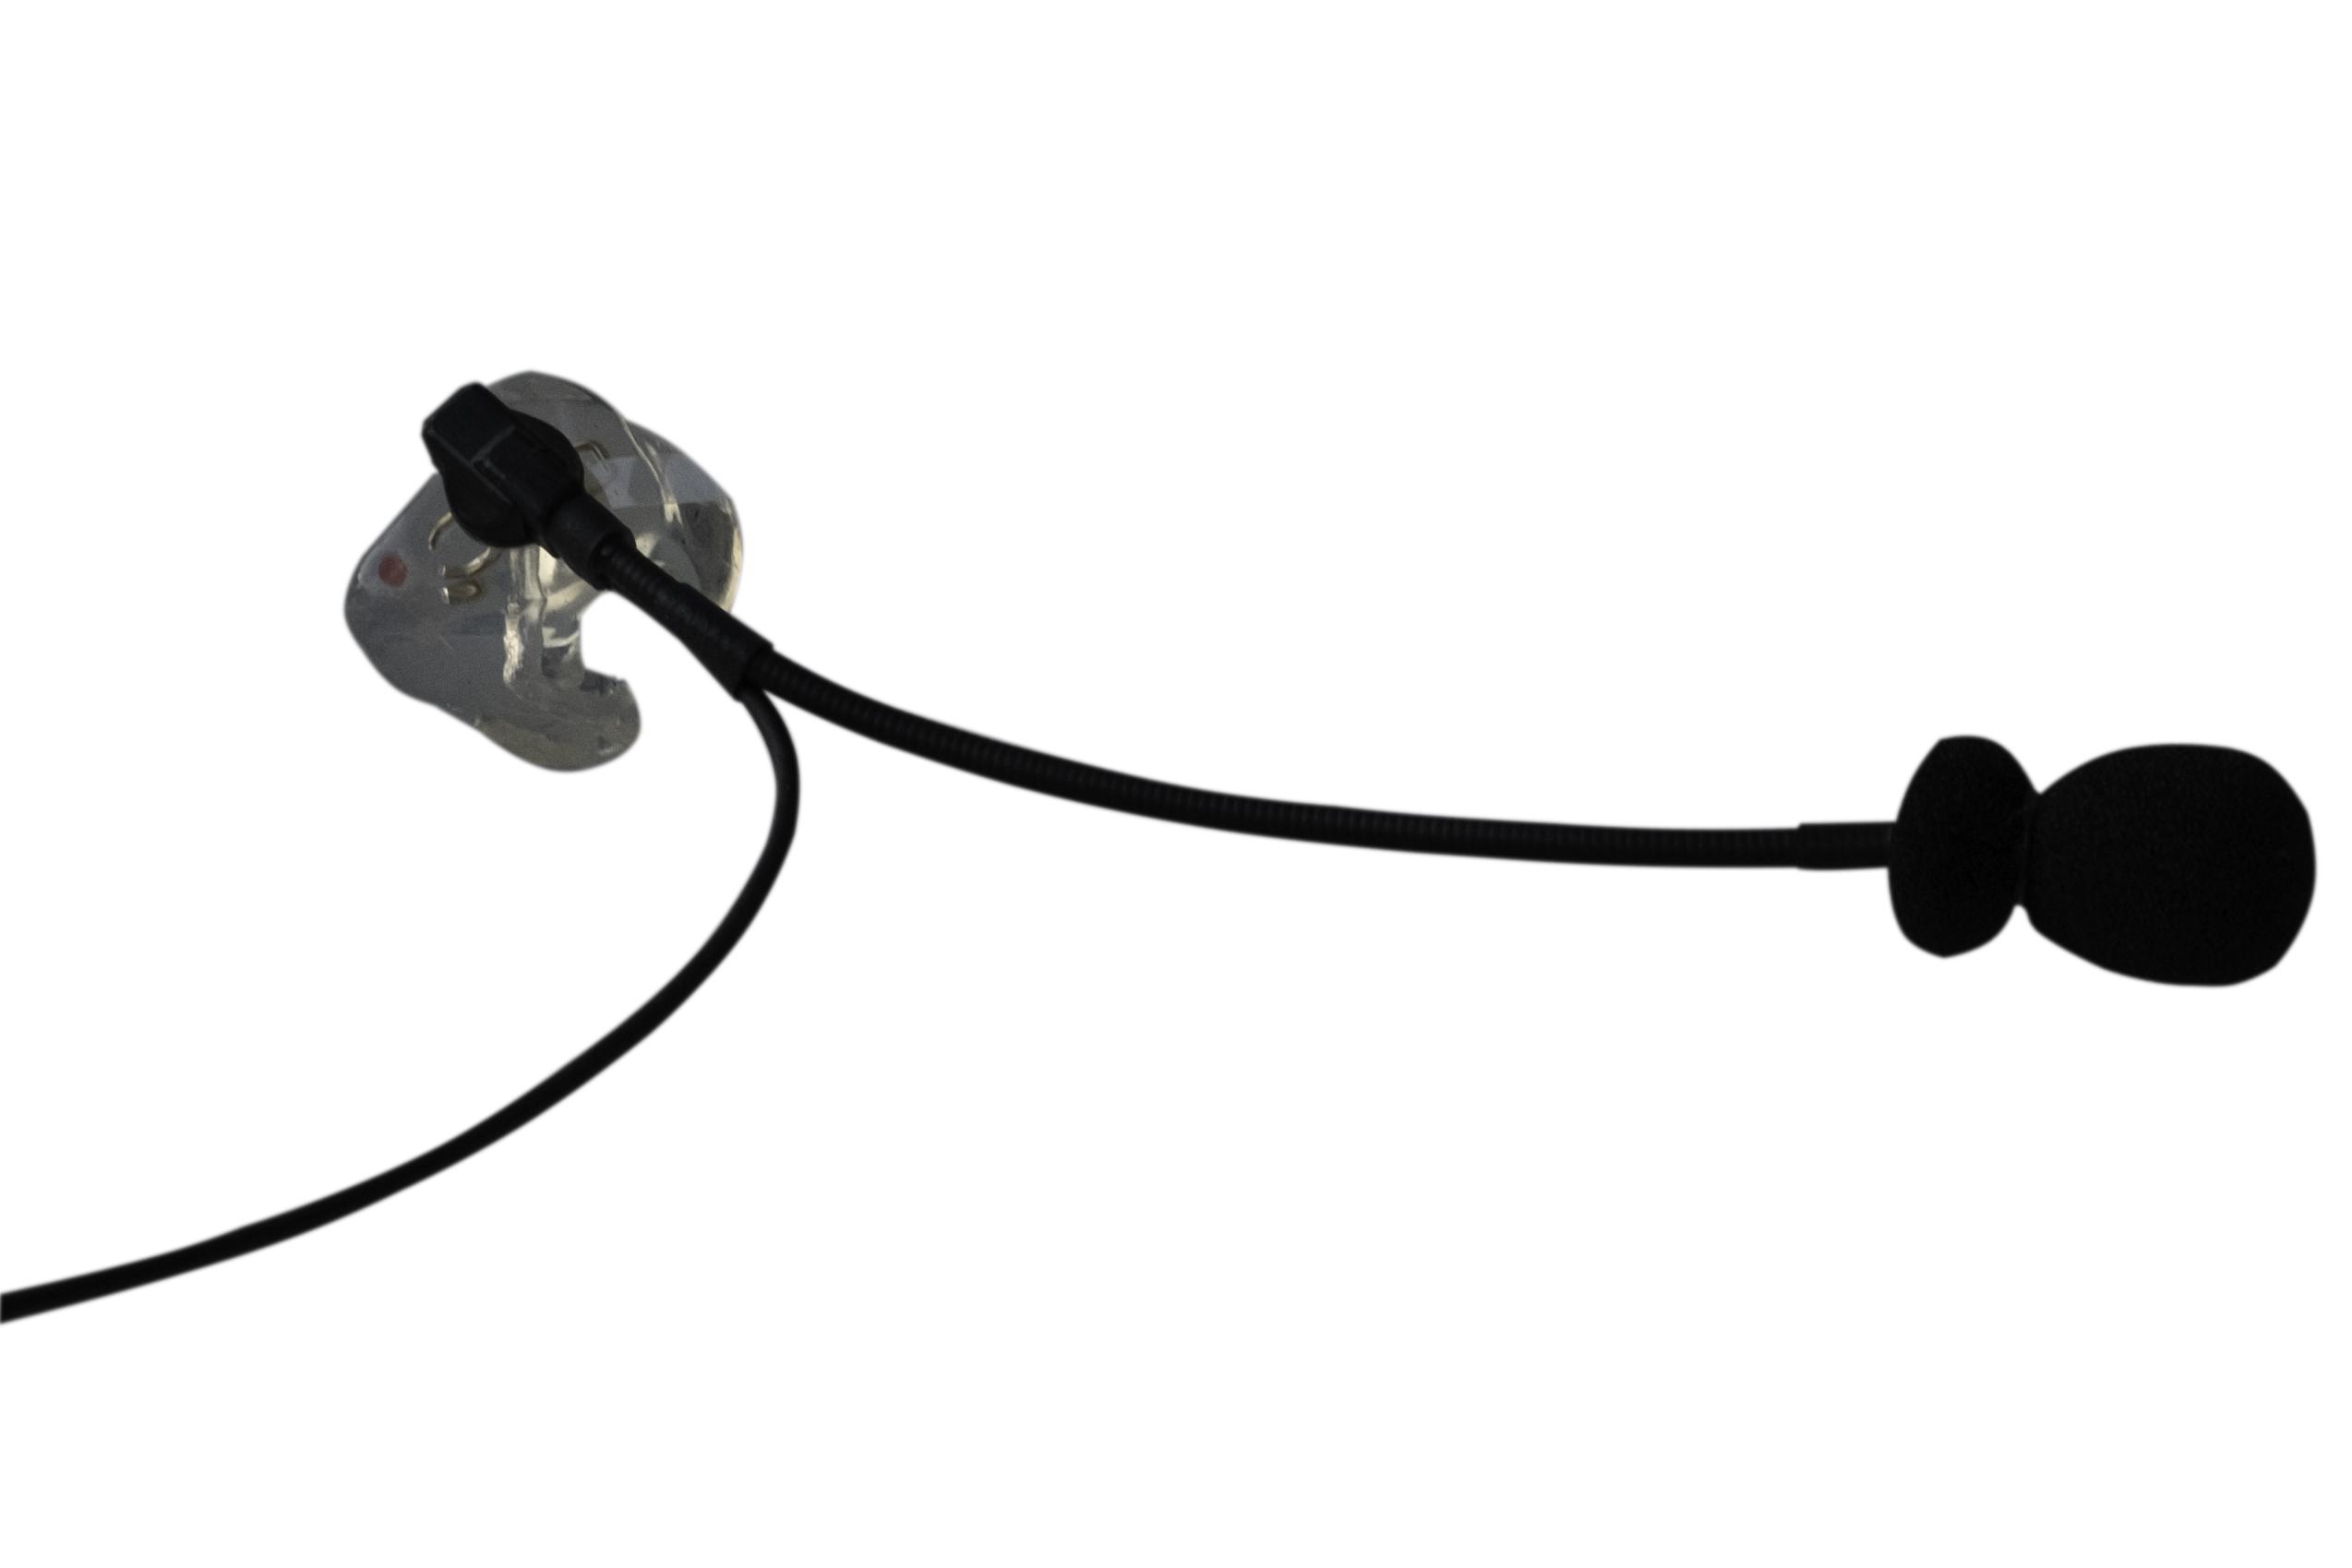 axiwi-he-050-headset-custom-made- earpiece